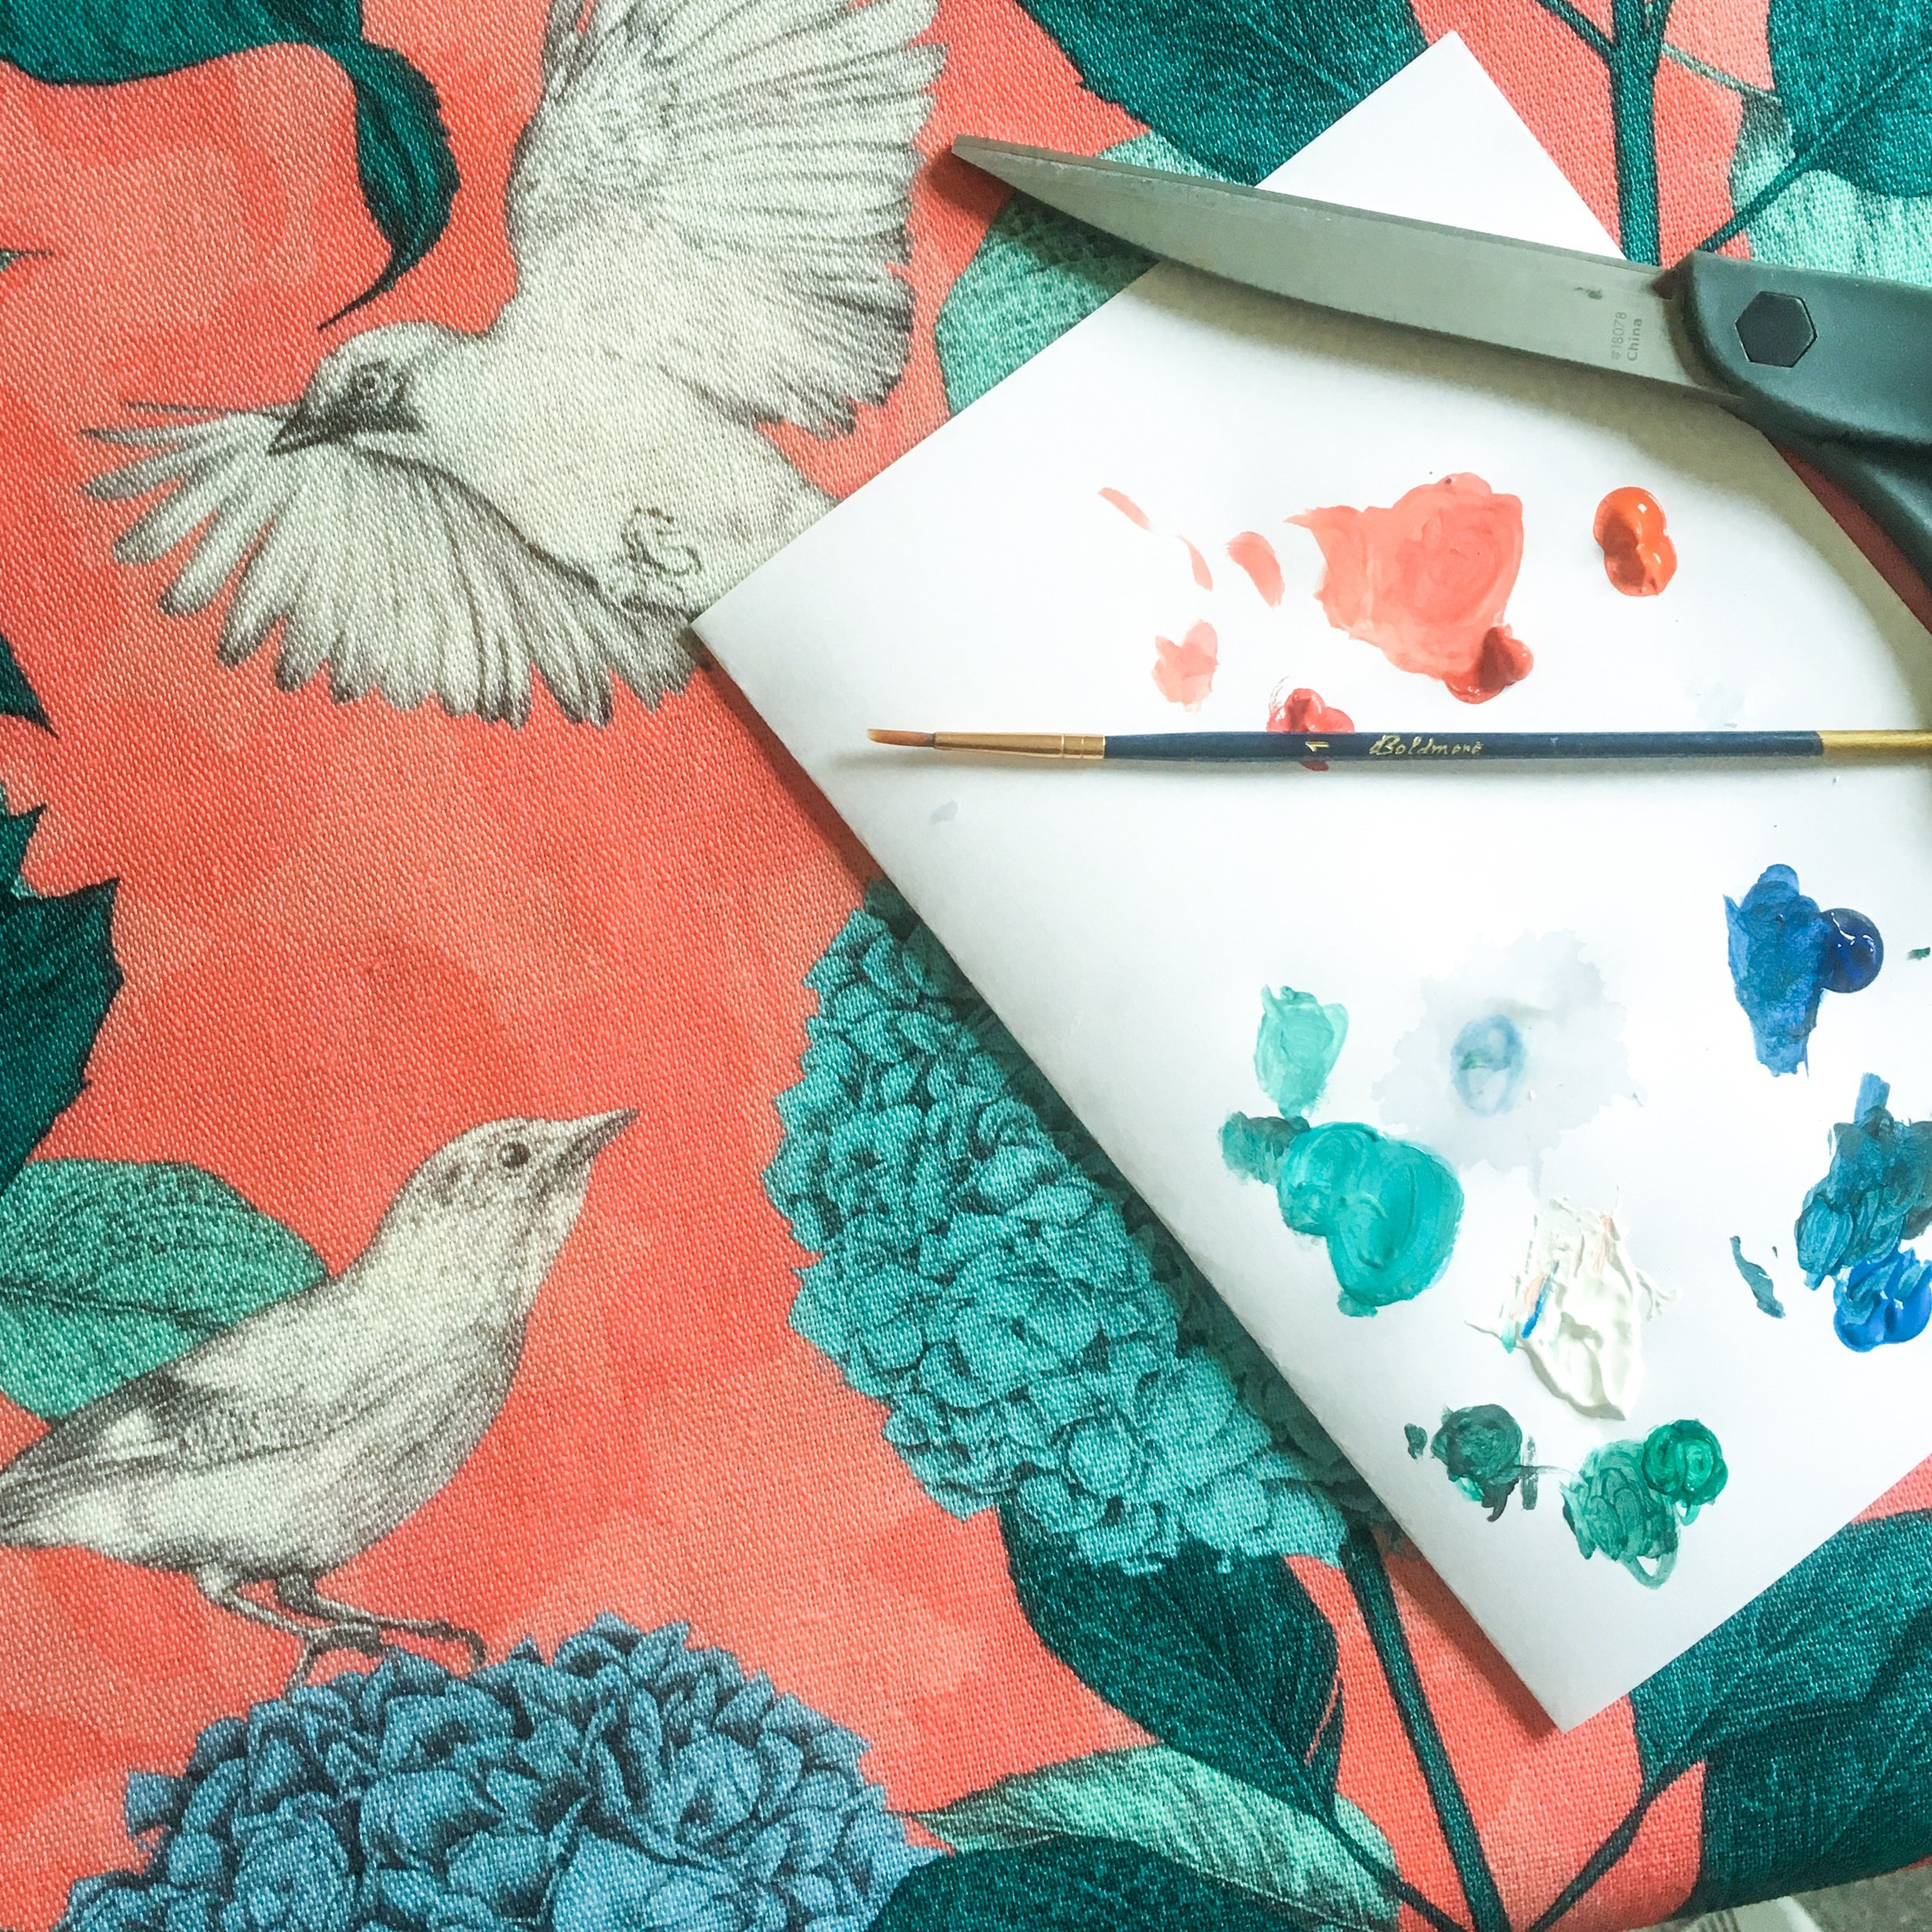 Colour Sampling | April Mawhinney Design Studio | Lough Cuan Collection | Linen Fabrics | Upholstery Fabric | Irish Design | UK Designer | Home Decor